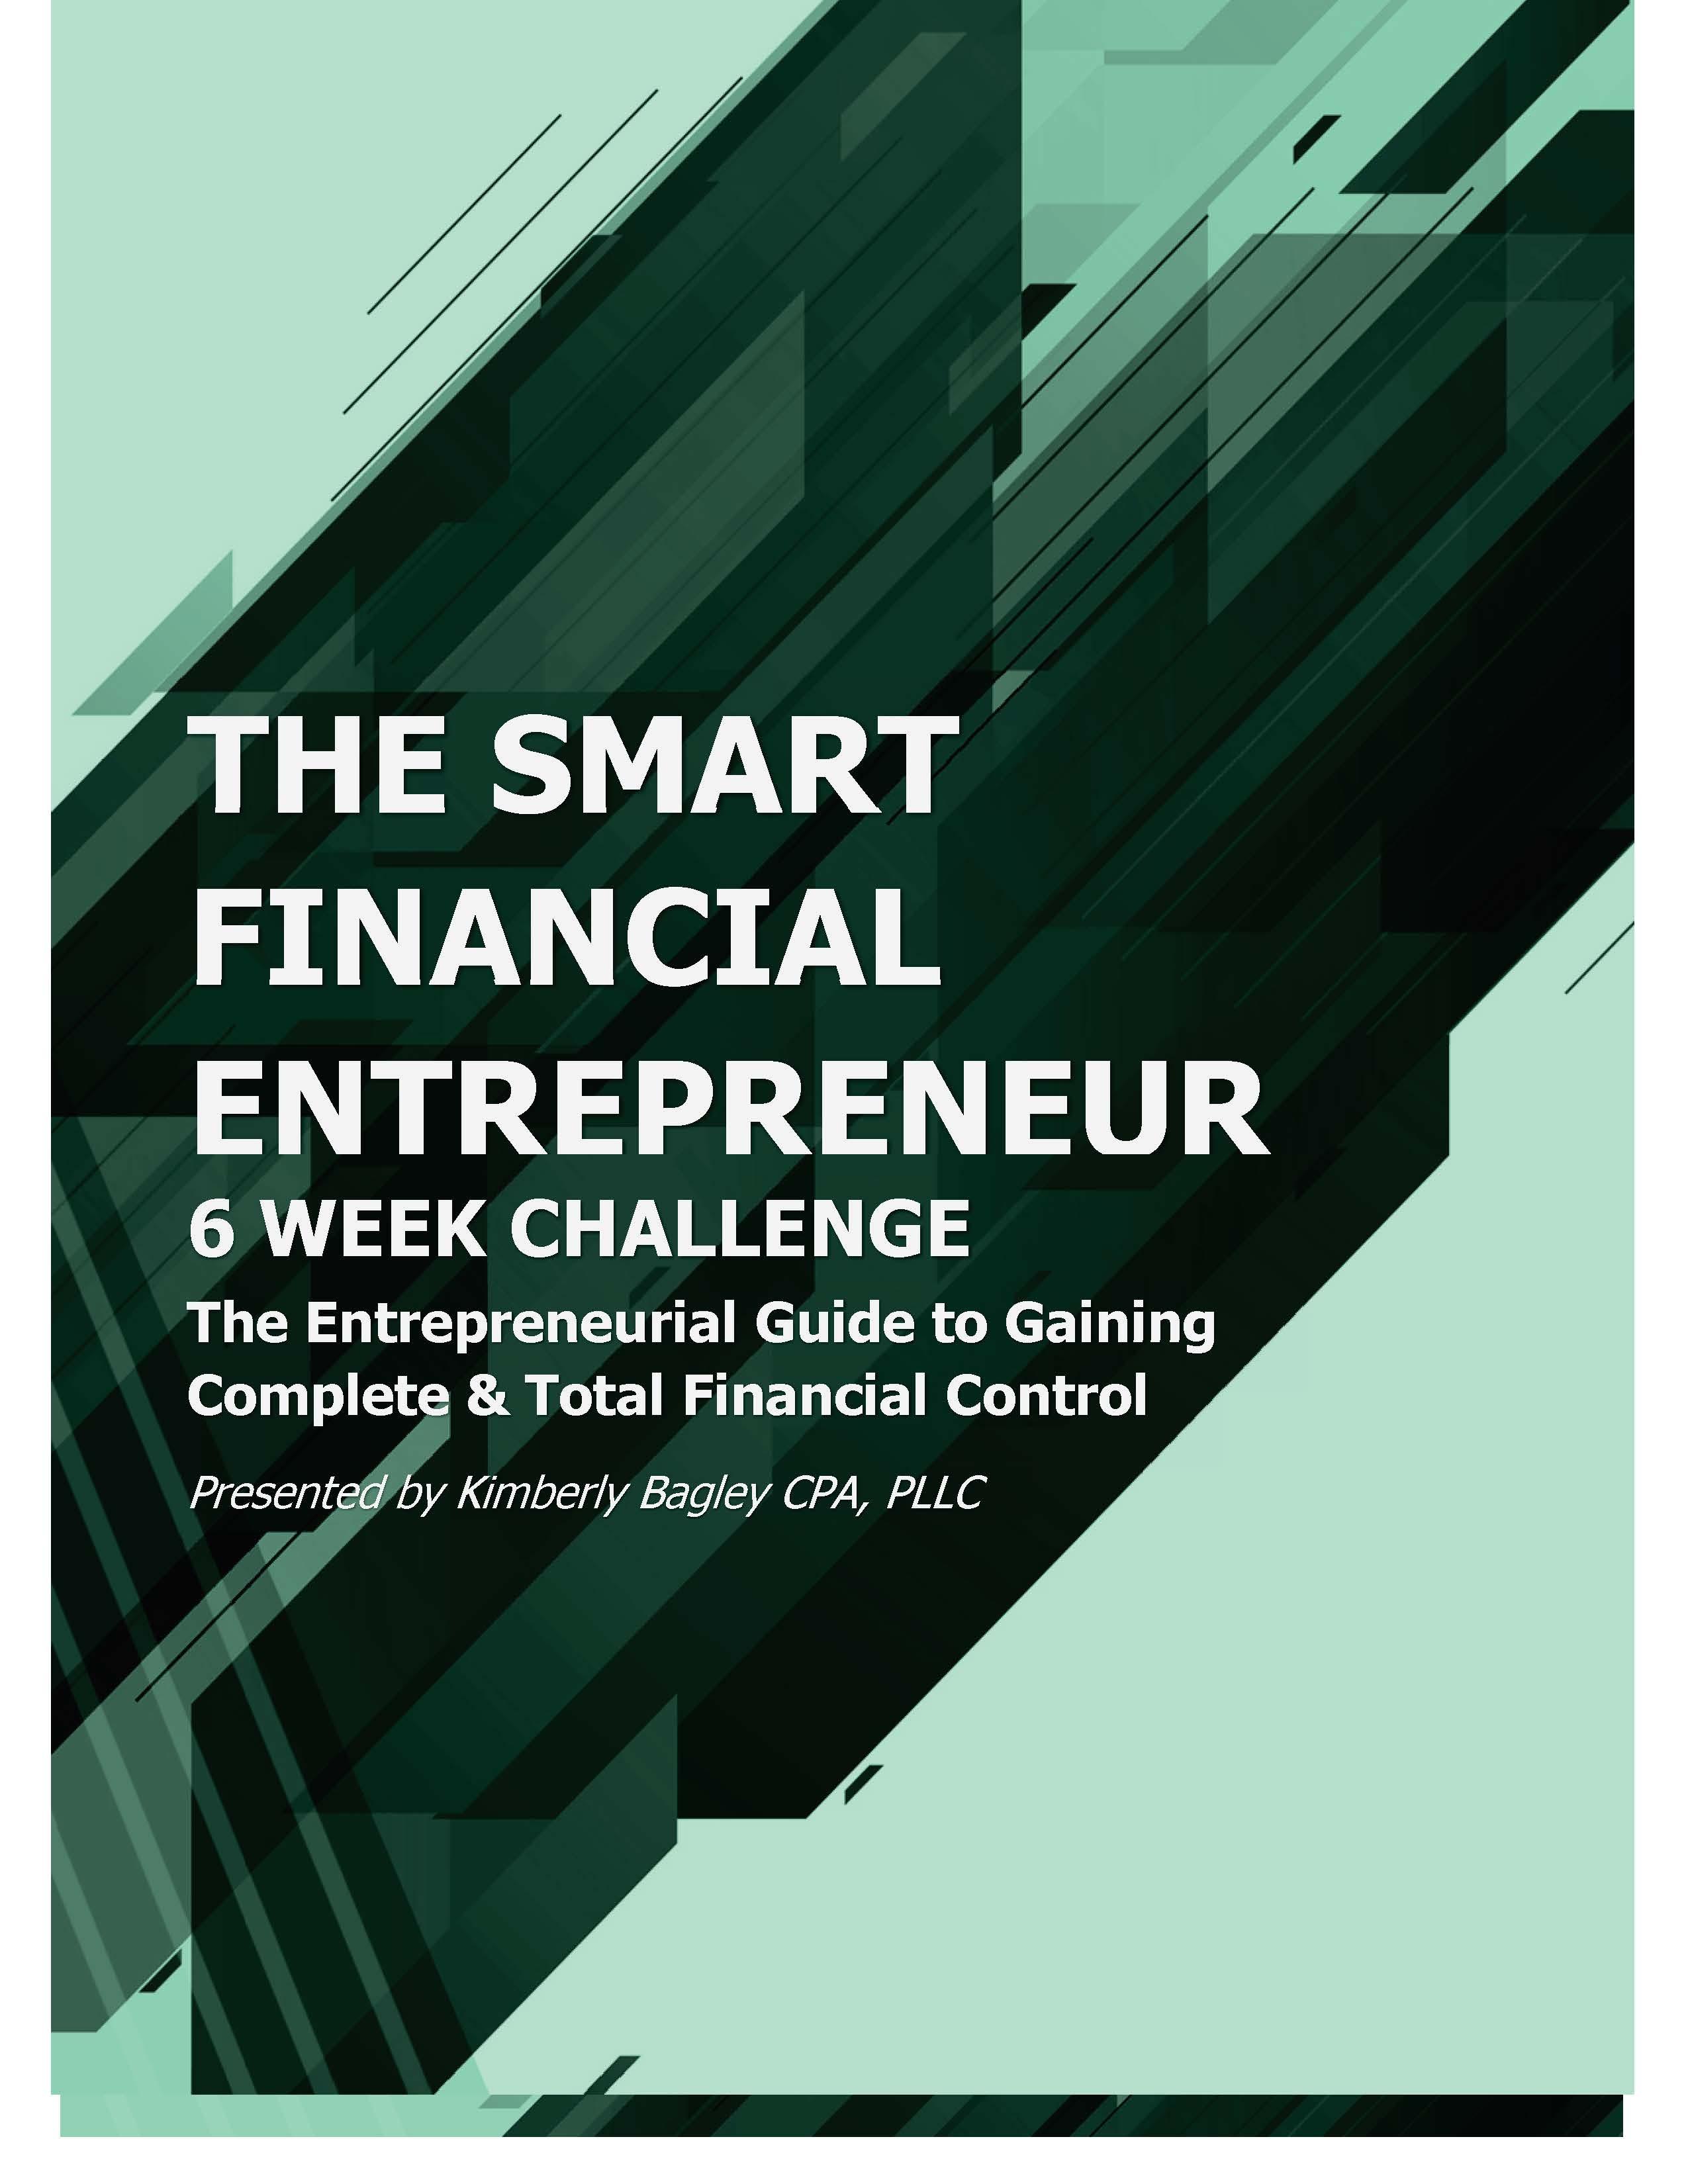 The Smart Financial Entrepreneur - 6 Week Challenge